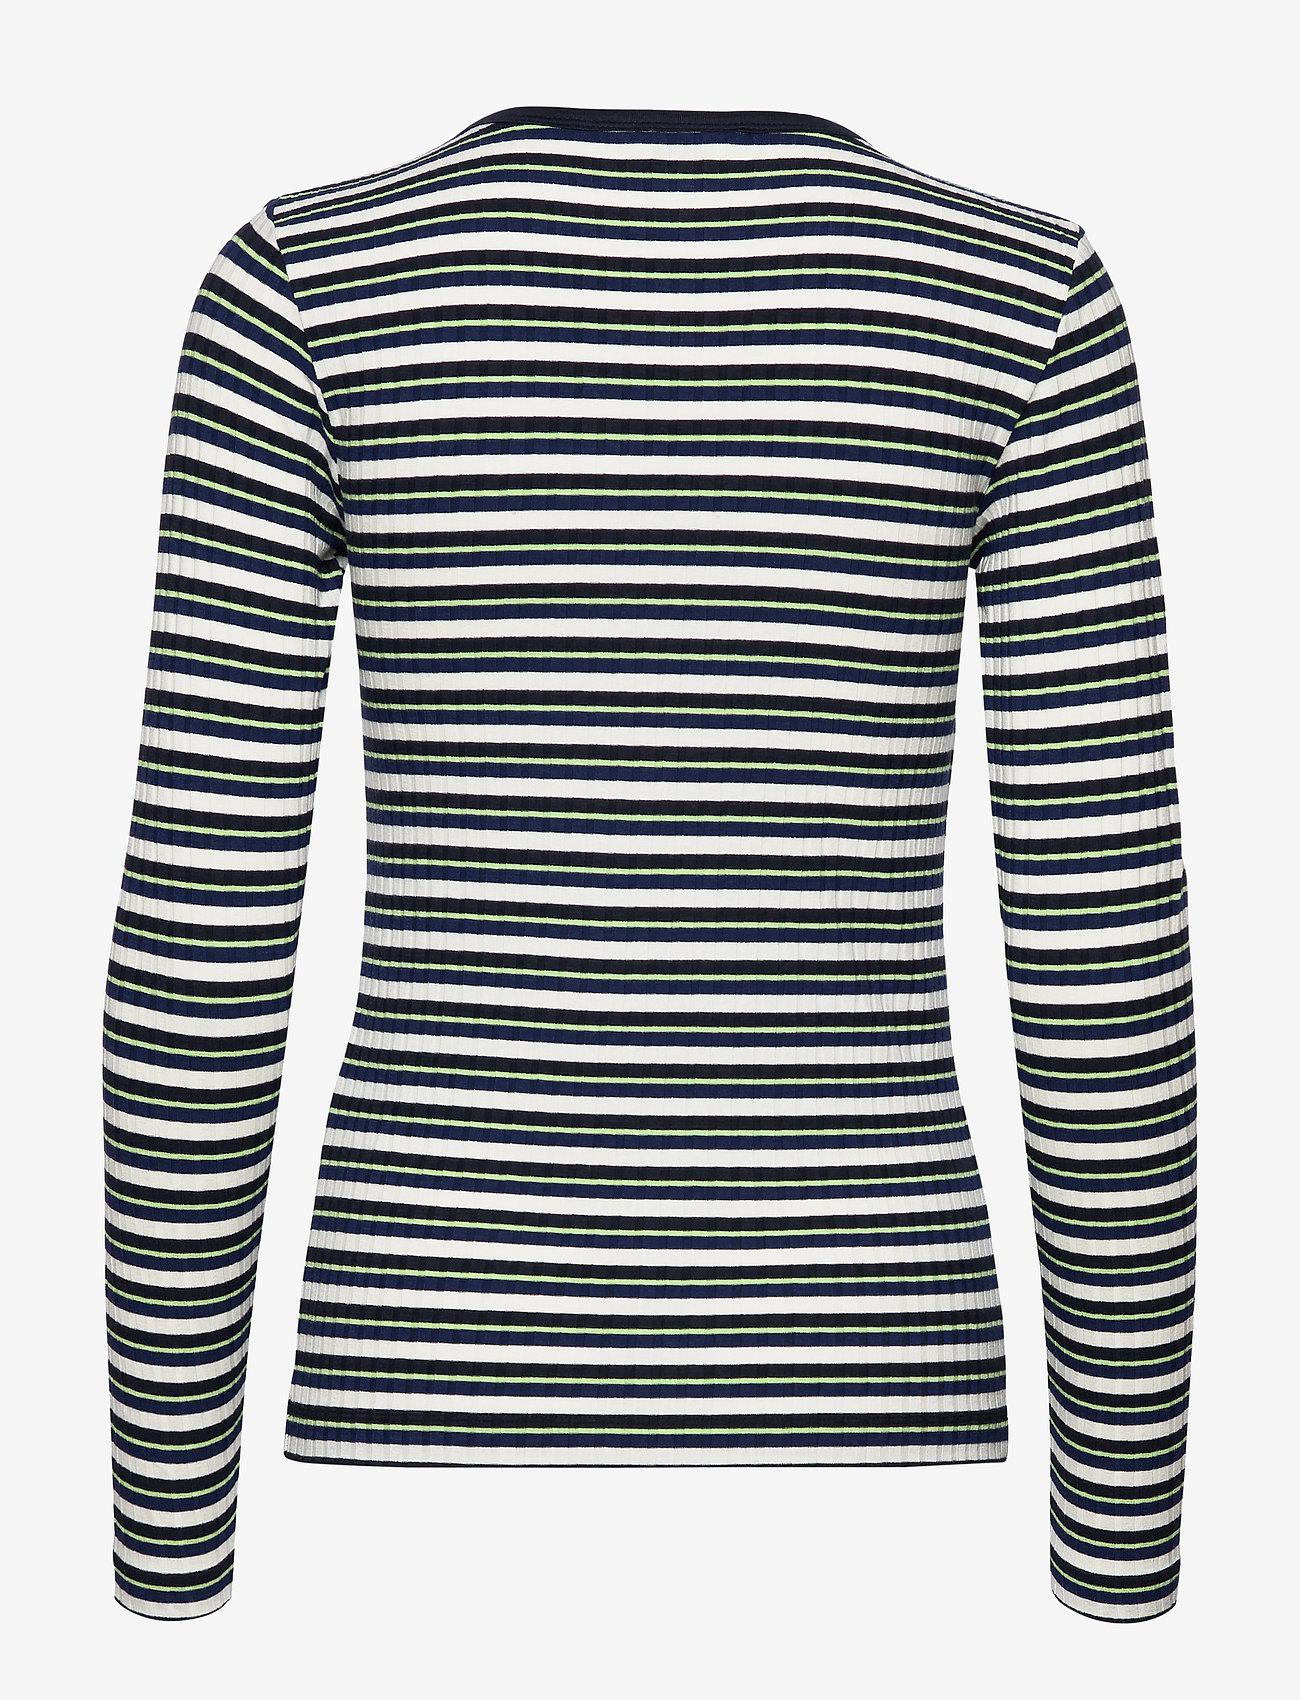 5x5 Dream Stripe Carolla Short (Navy Multi) (630 kr) - Mads Nørgaard